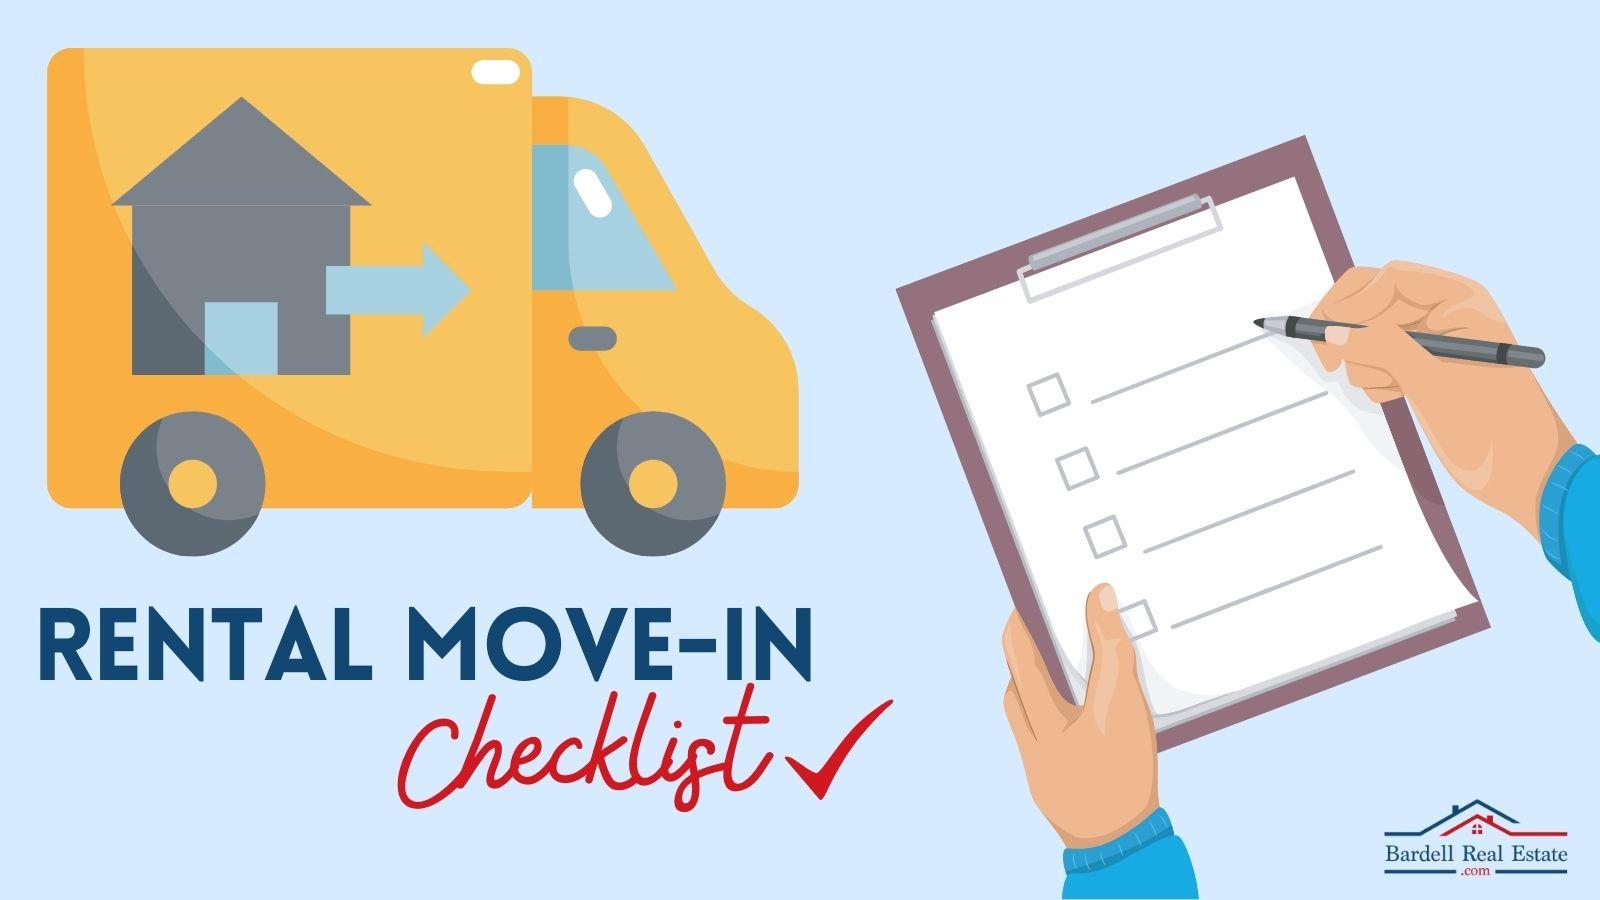 Rental Move-In Checklist sign